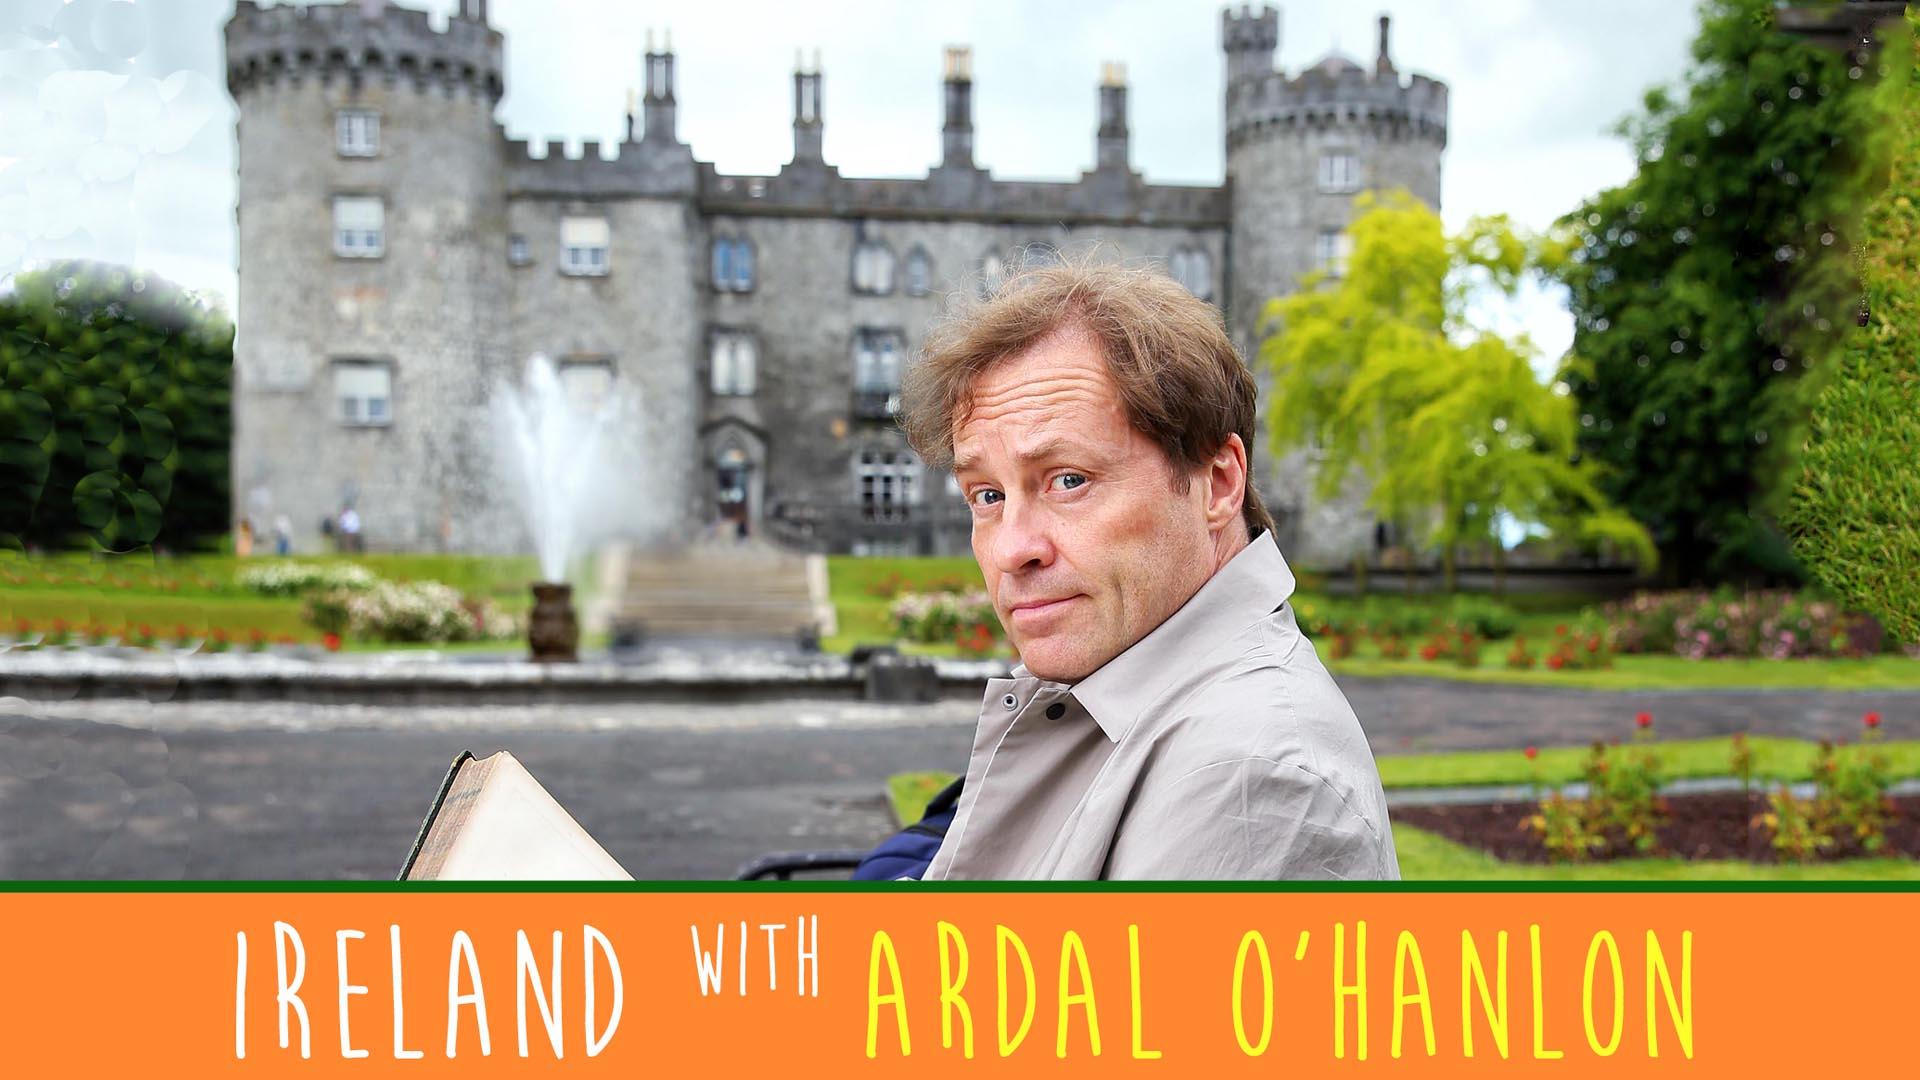 Ireland With Ardal O'Hanlon -